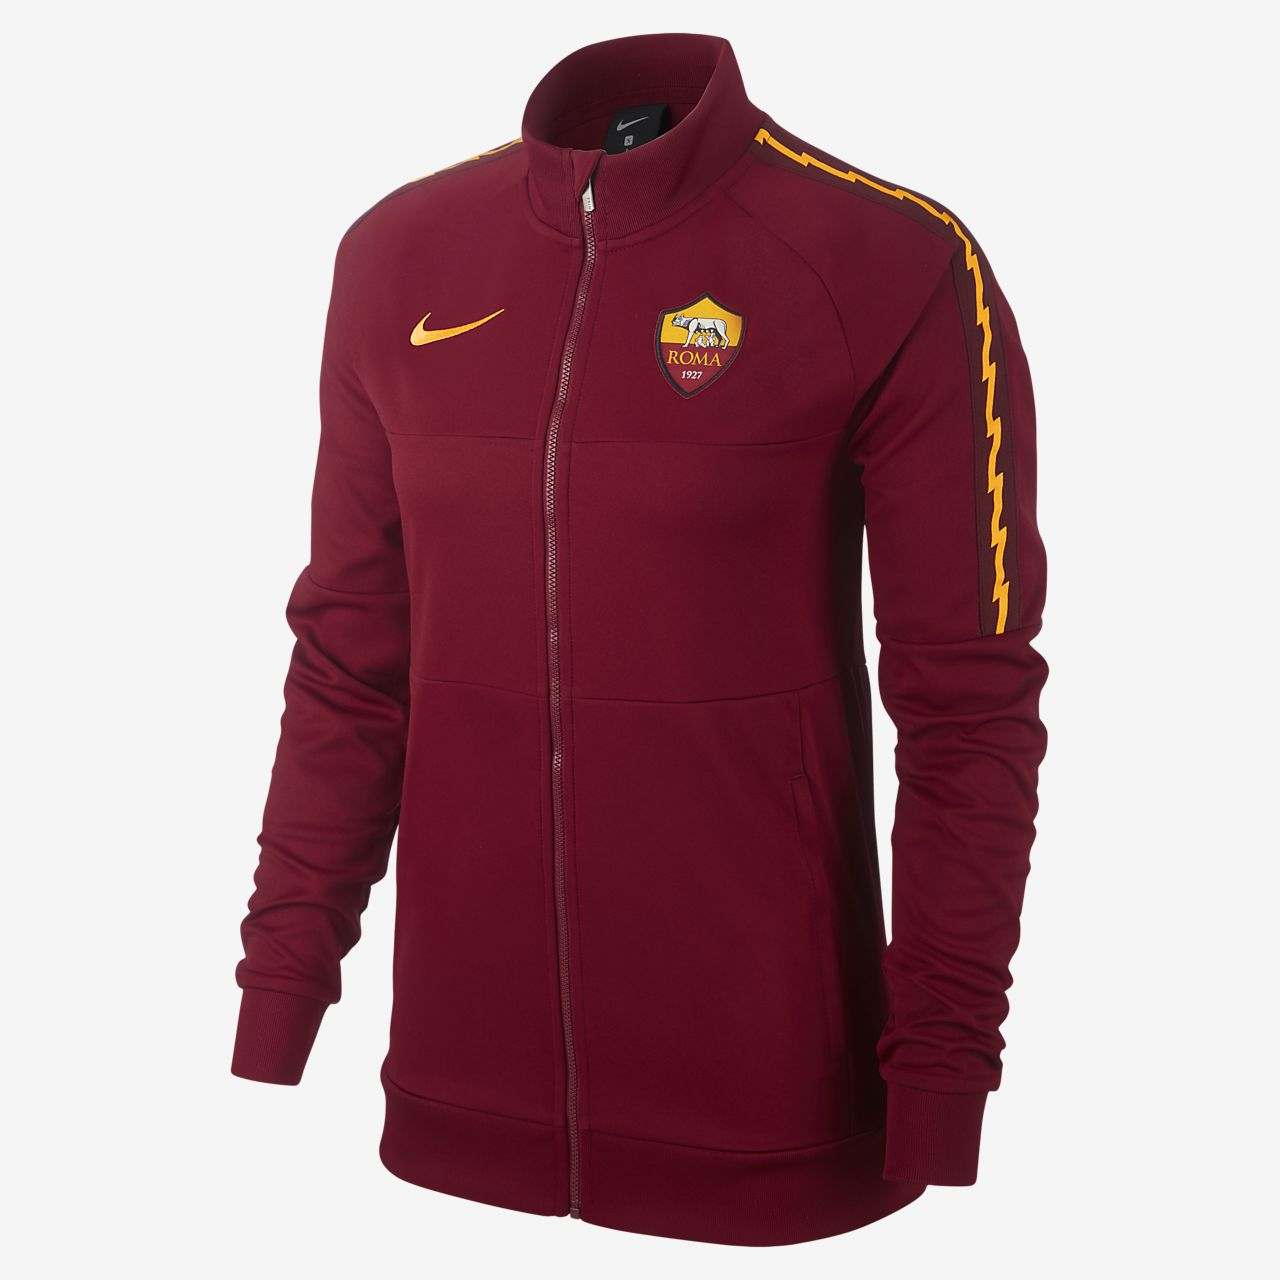 Женская куртка A.S. Roma